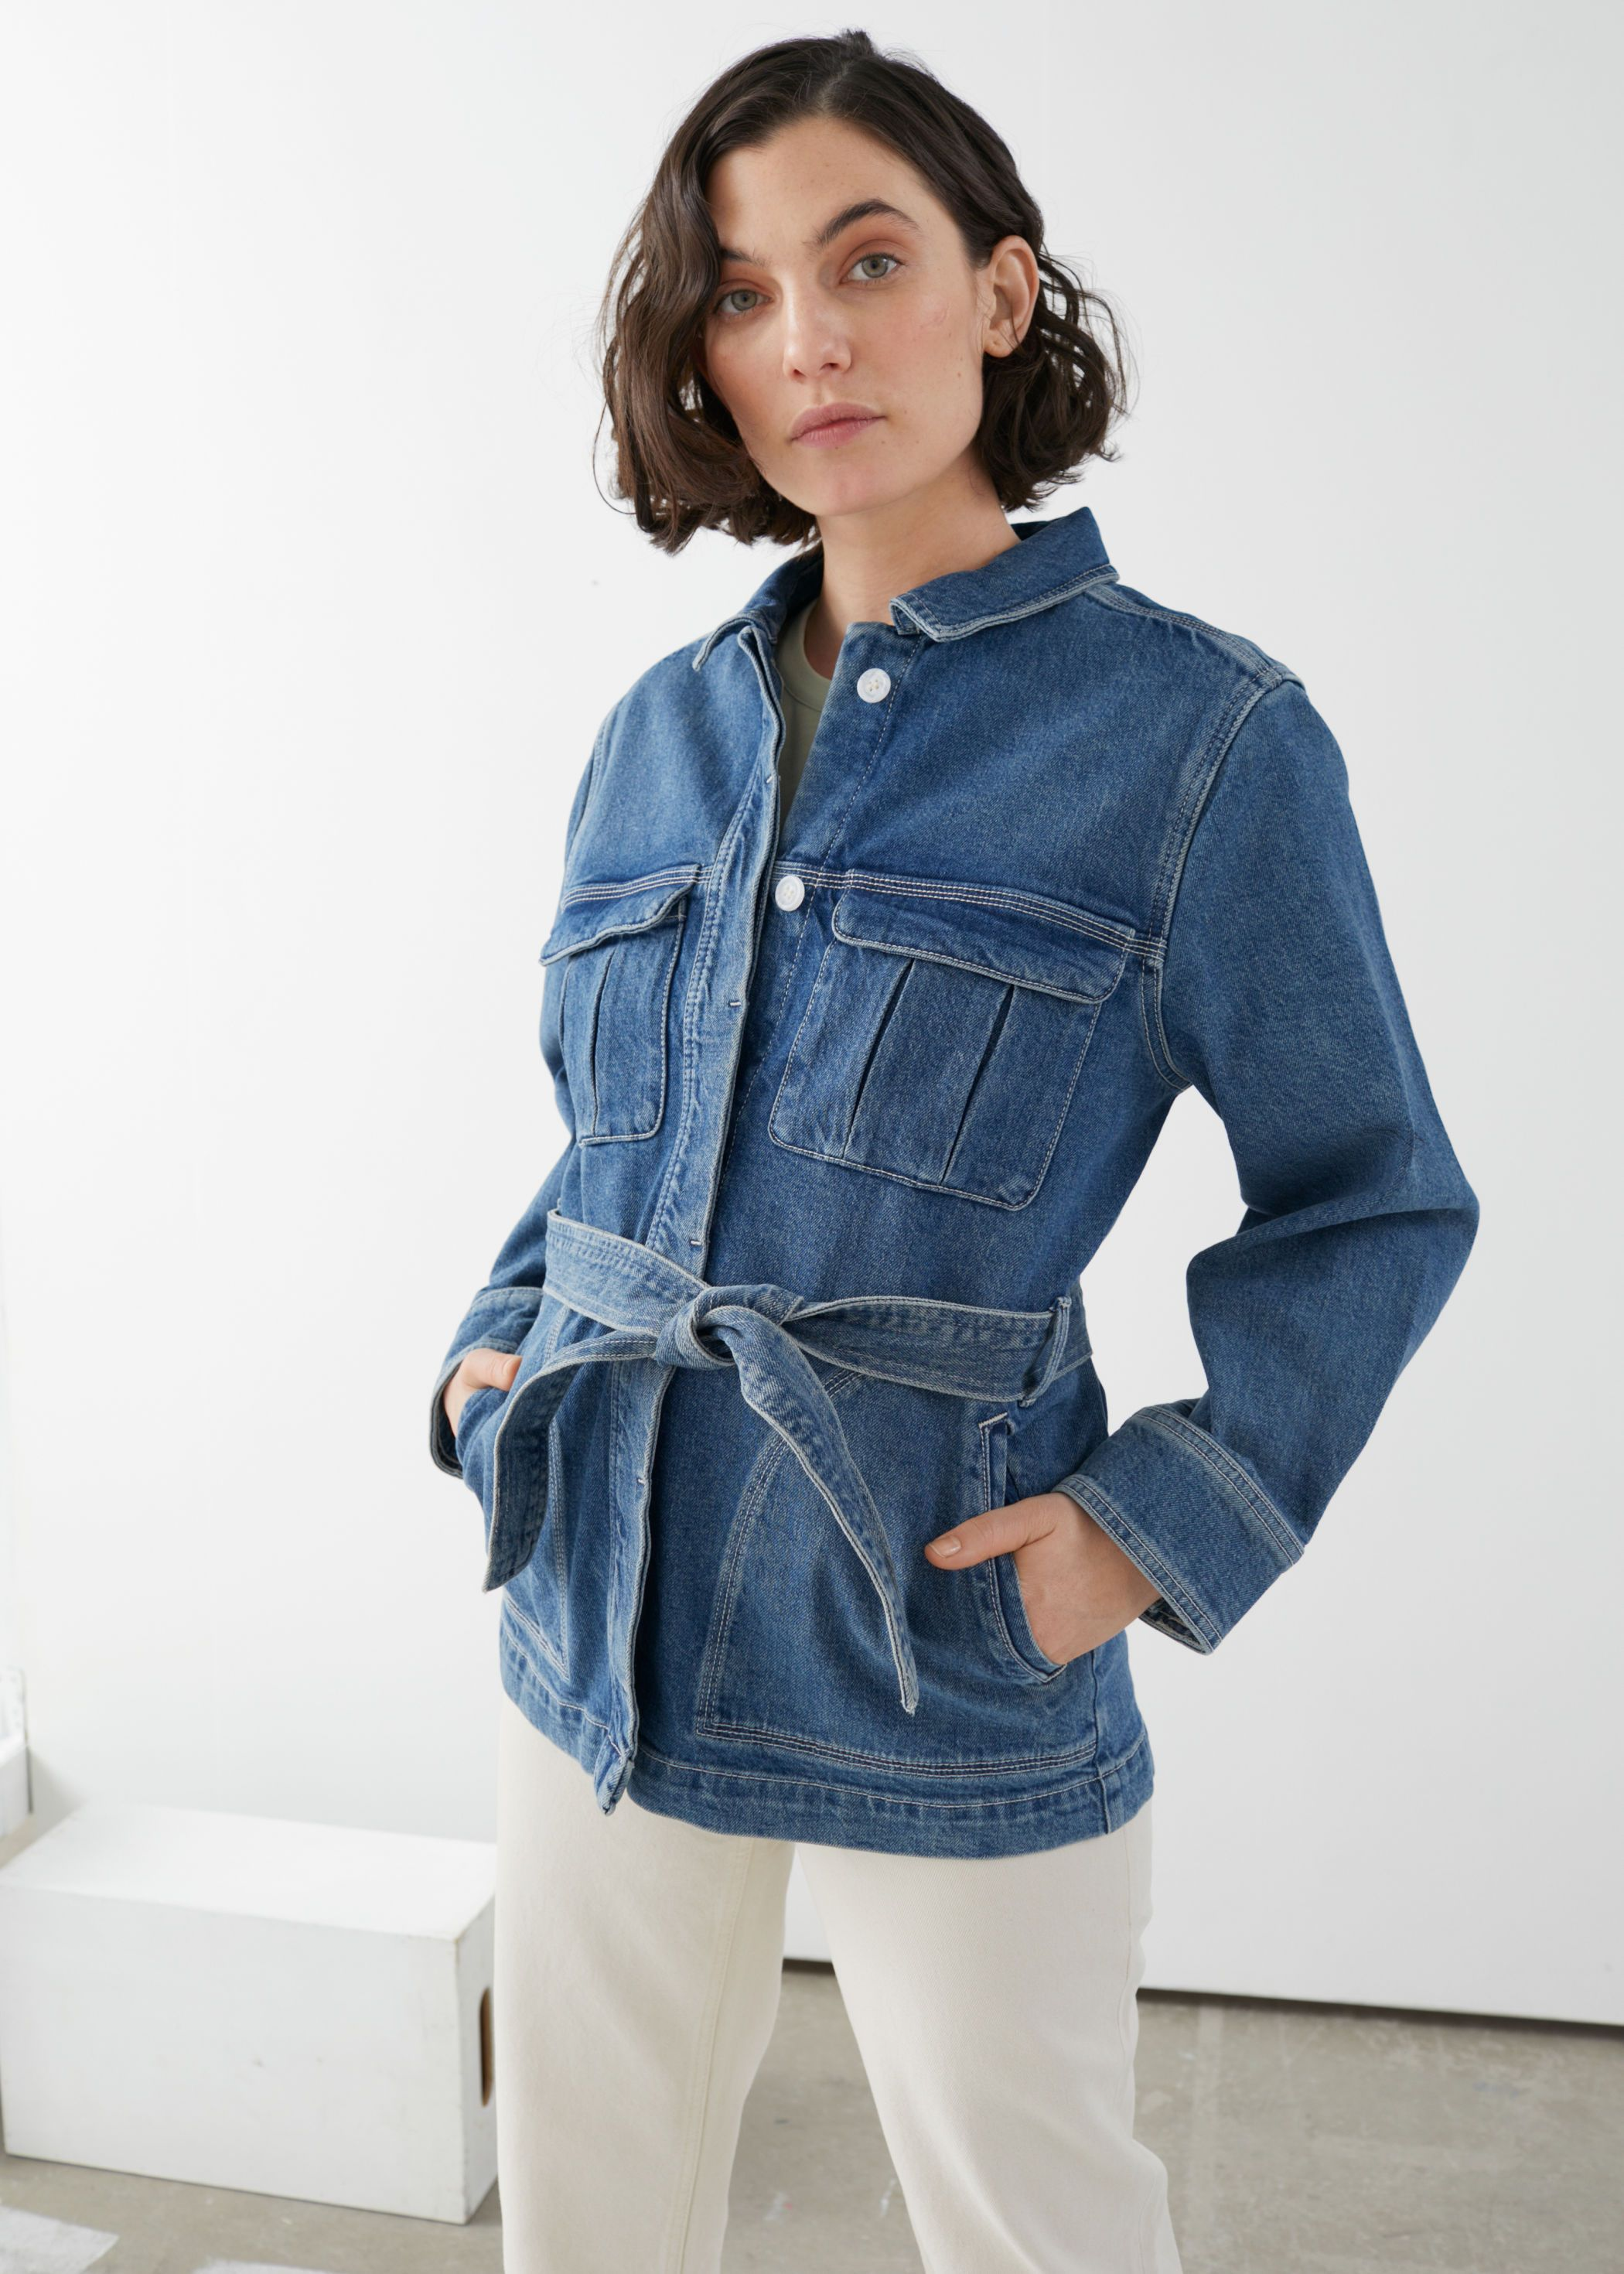 Pdp Oversized Denim Jacket Denim Jacket Women Denim Jacket [ 2940 x 2100 Pixel ]